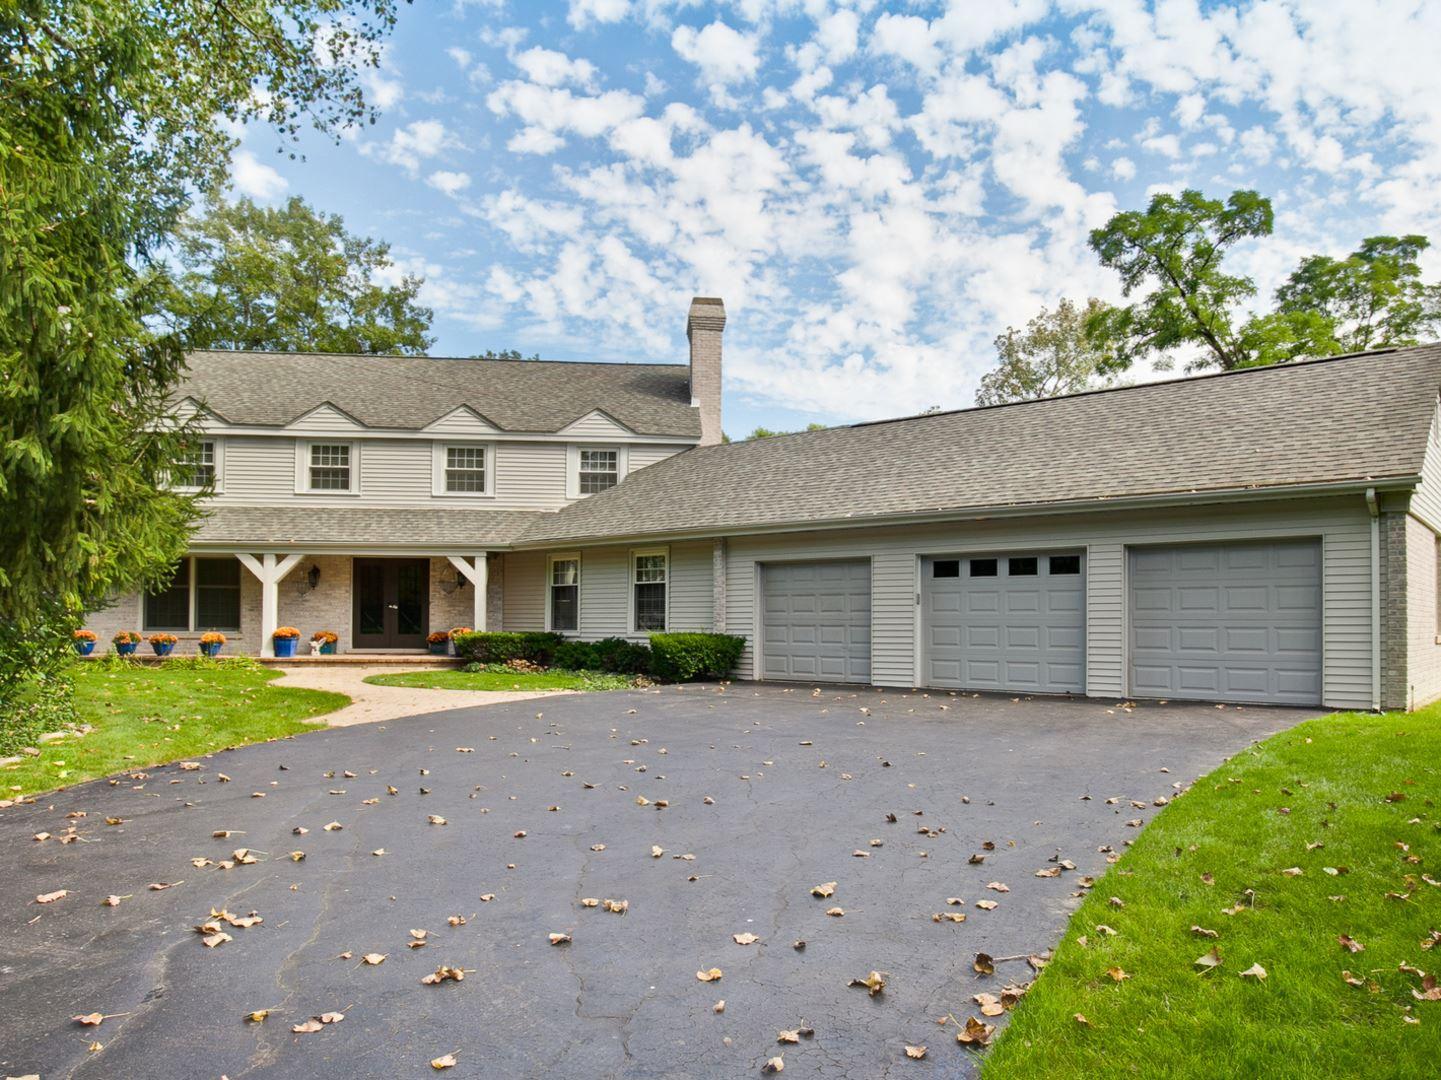 21 N Ridge Road, Lake Forest, IL 60045 - #: 10704349